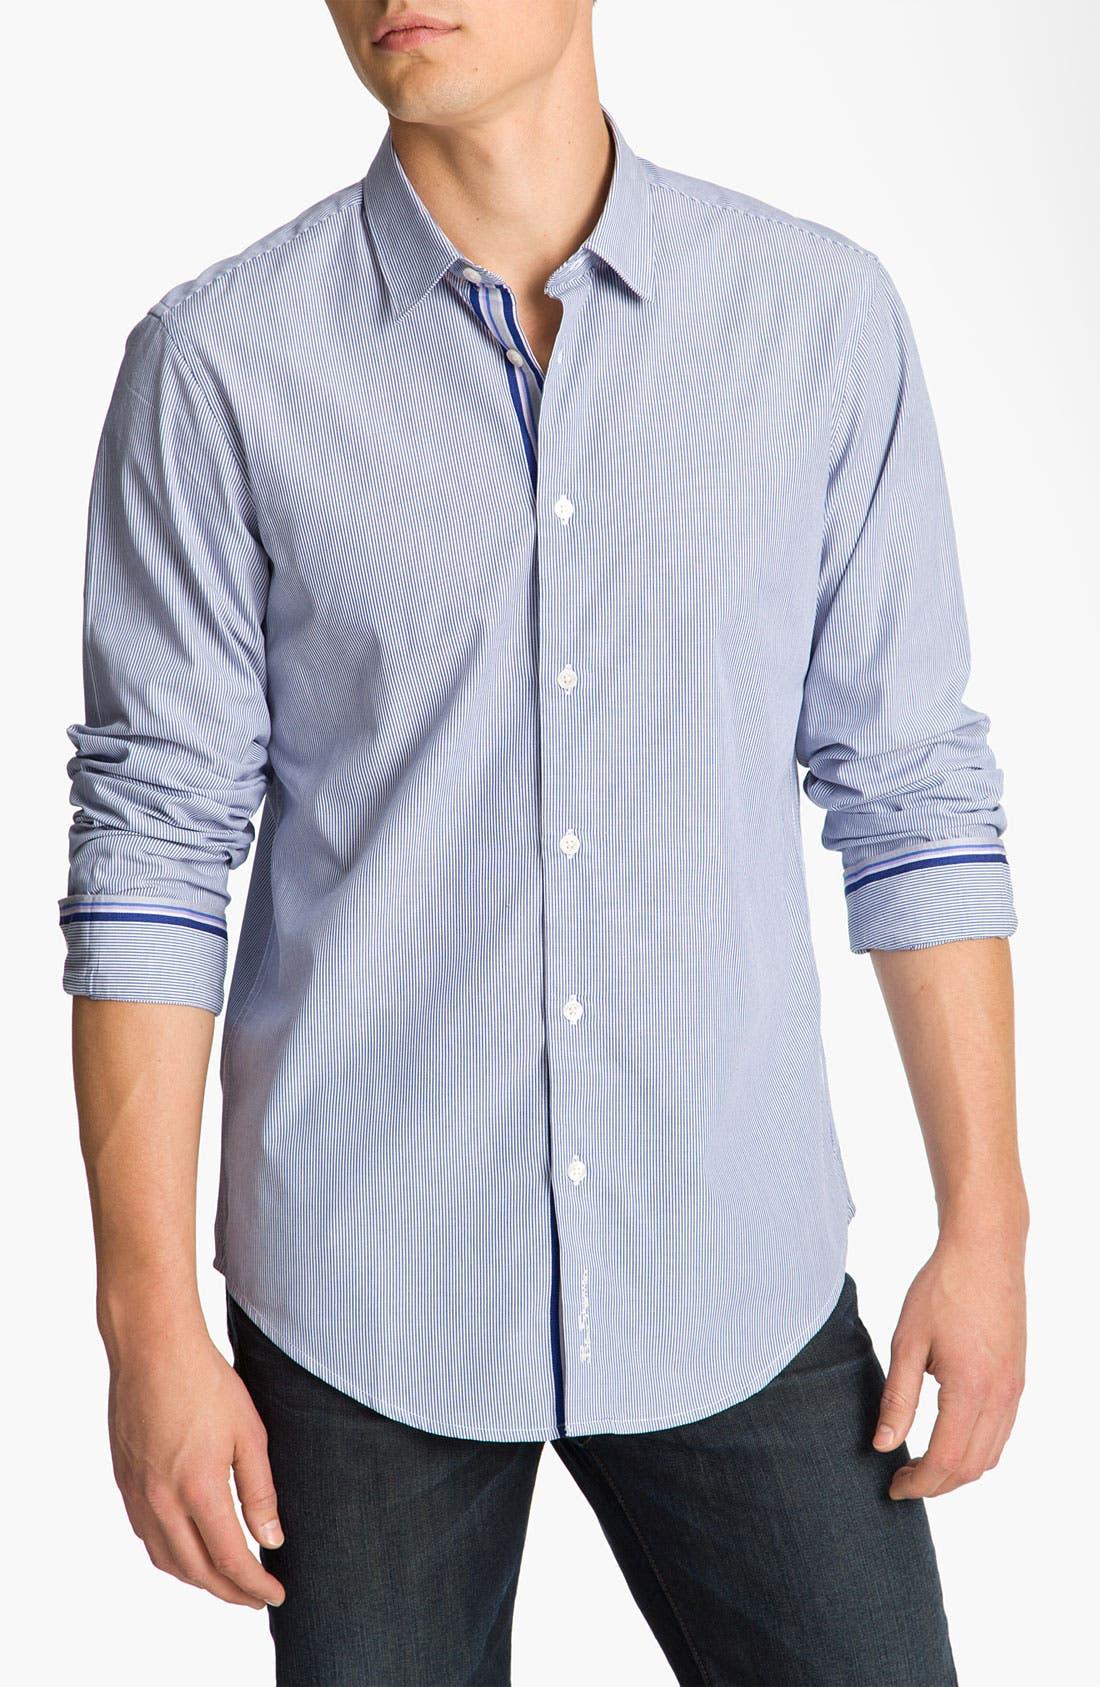 Alternate Image 1 Selected - Ben Sherman Stripe Woven Shirt